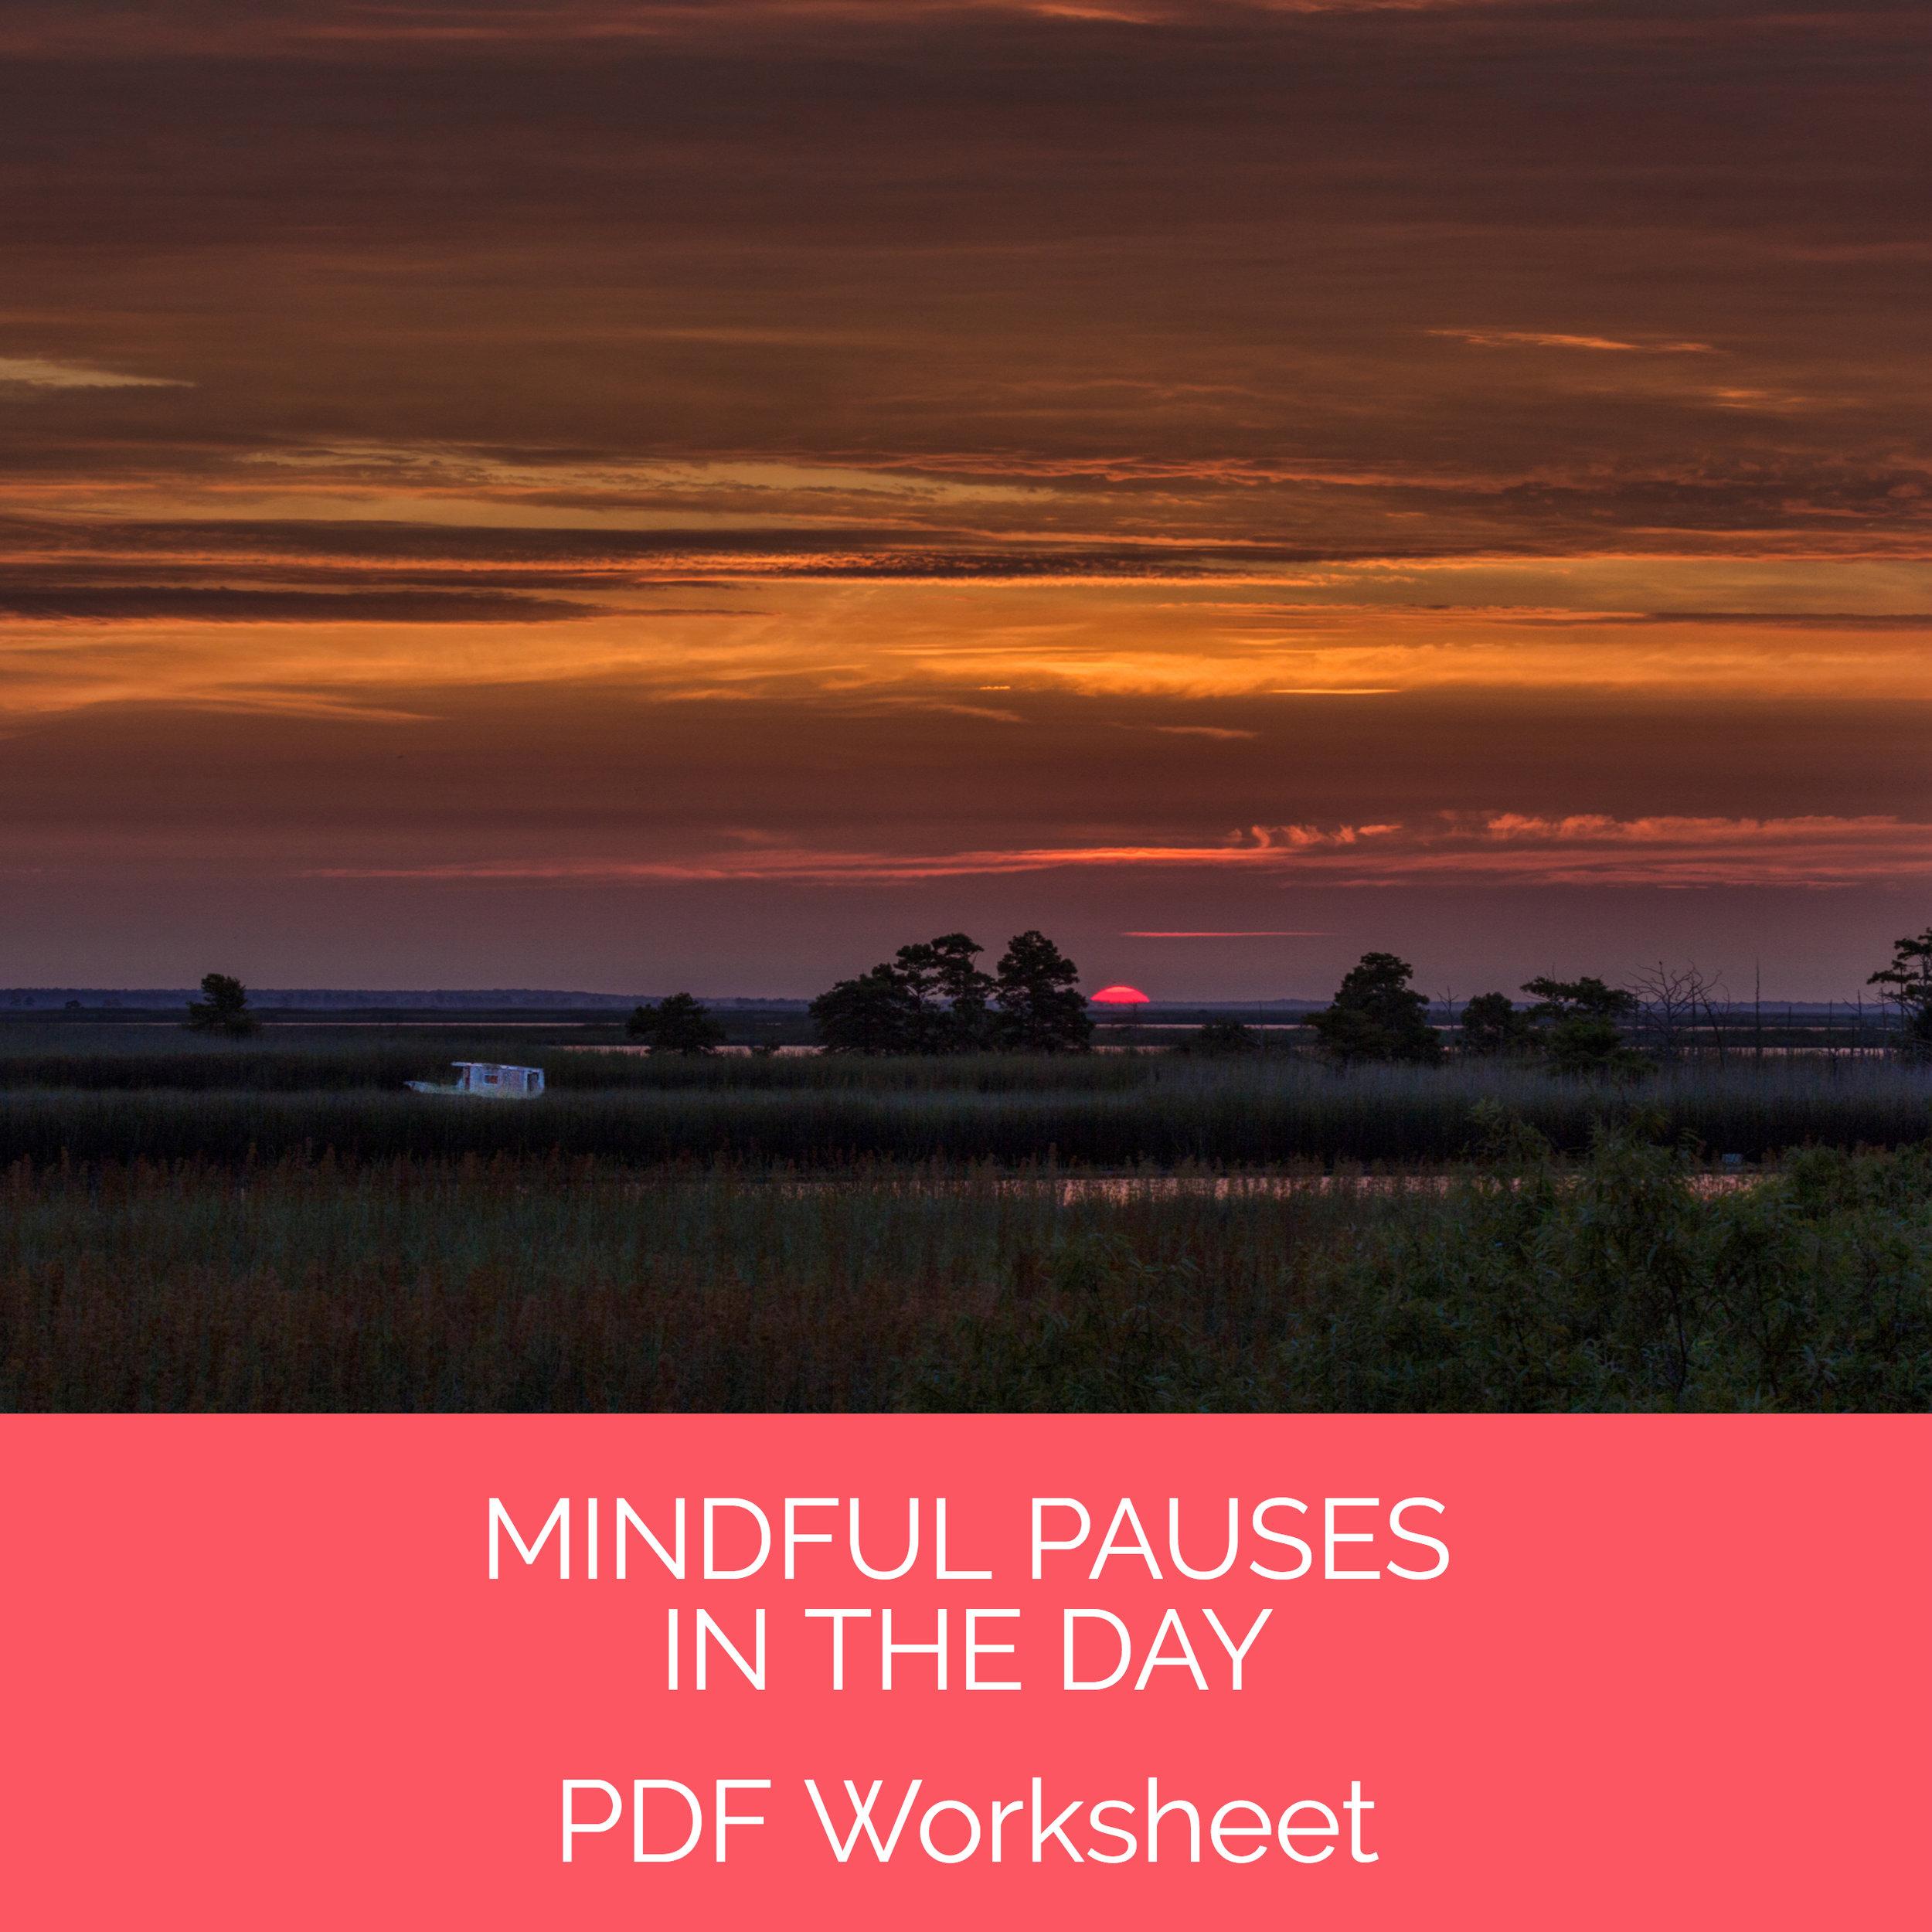 Mindful Pauses.jpg